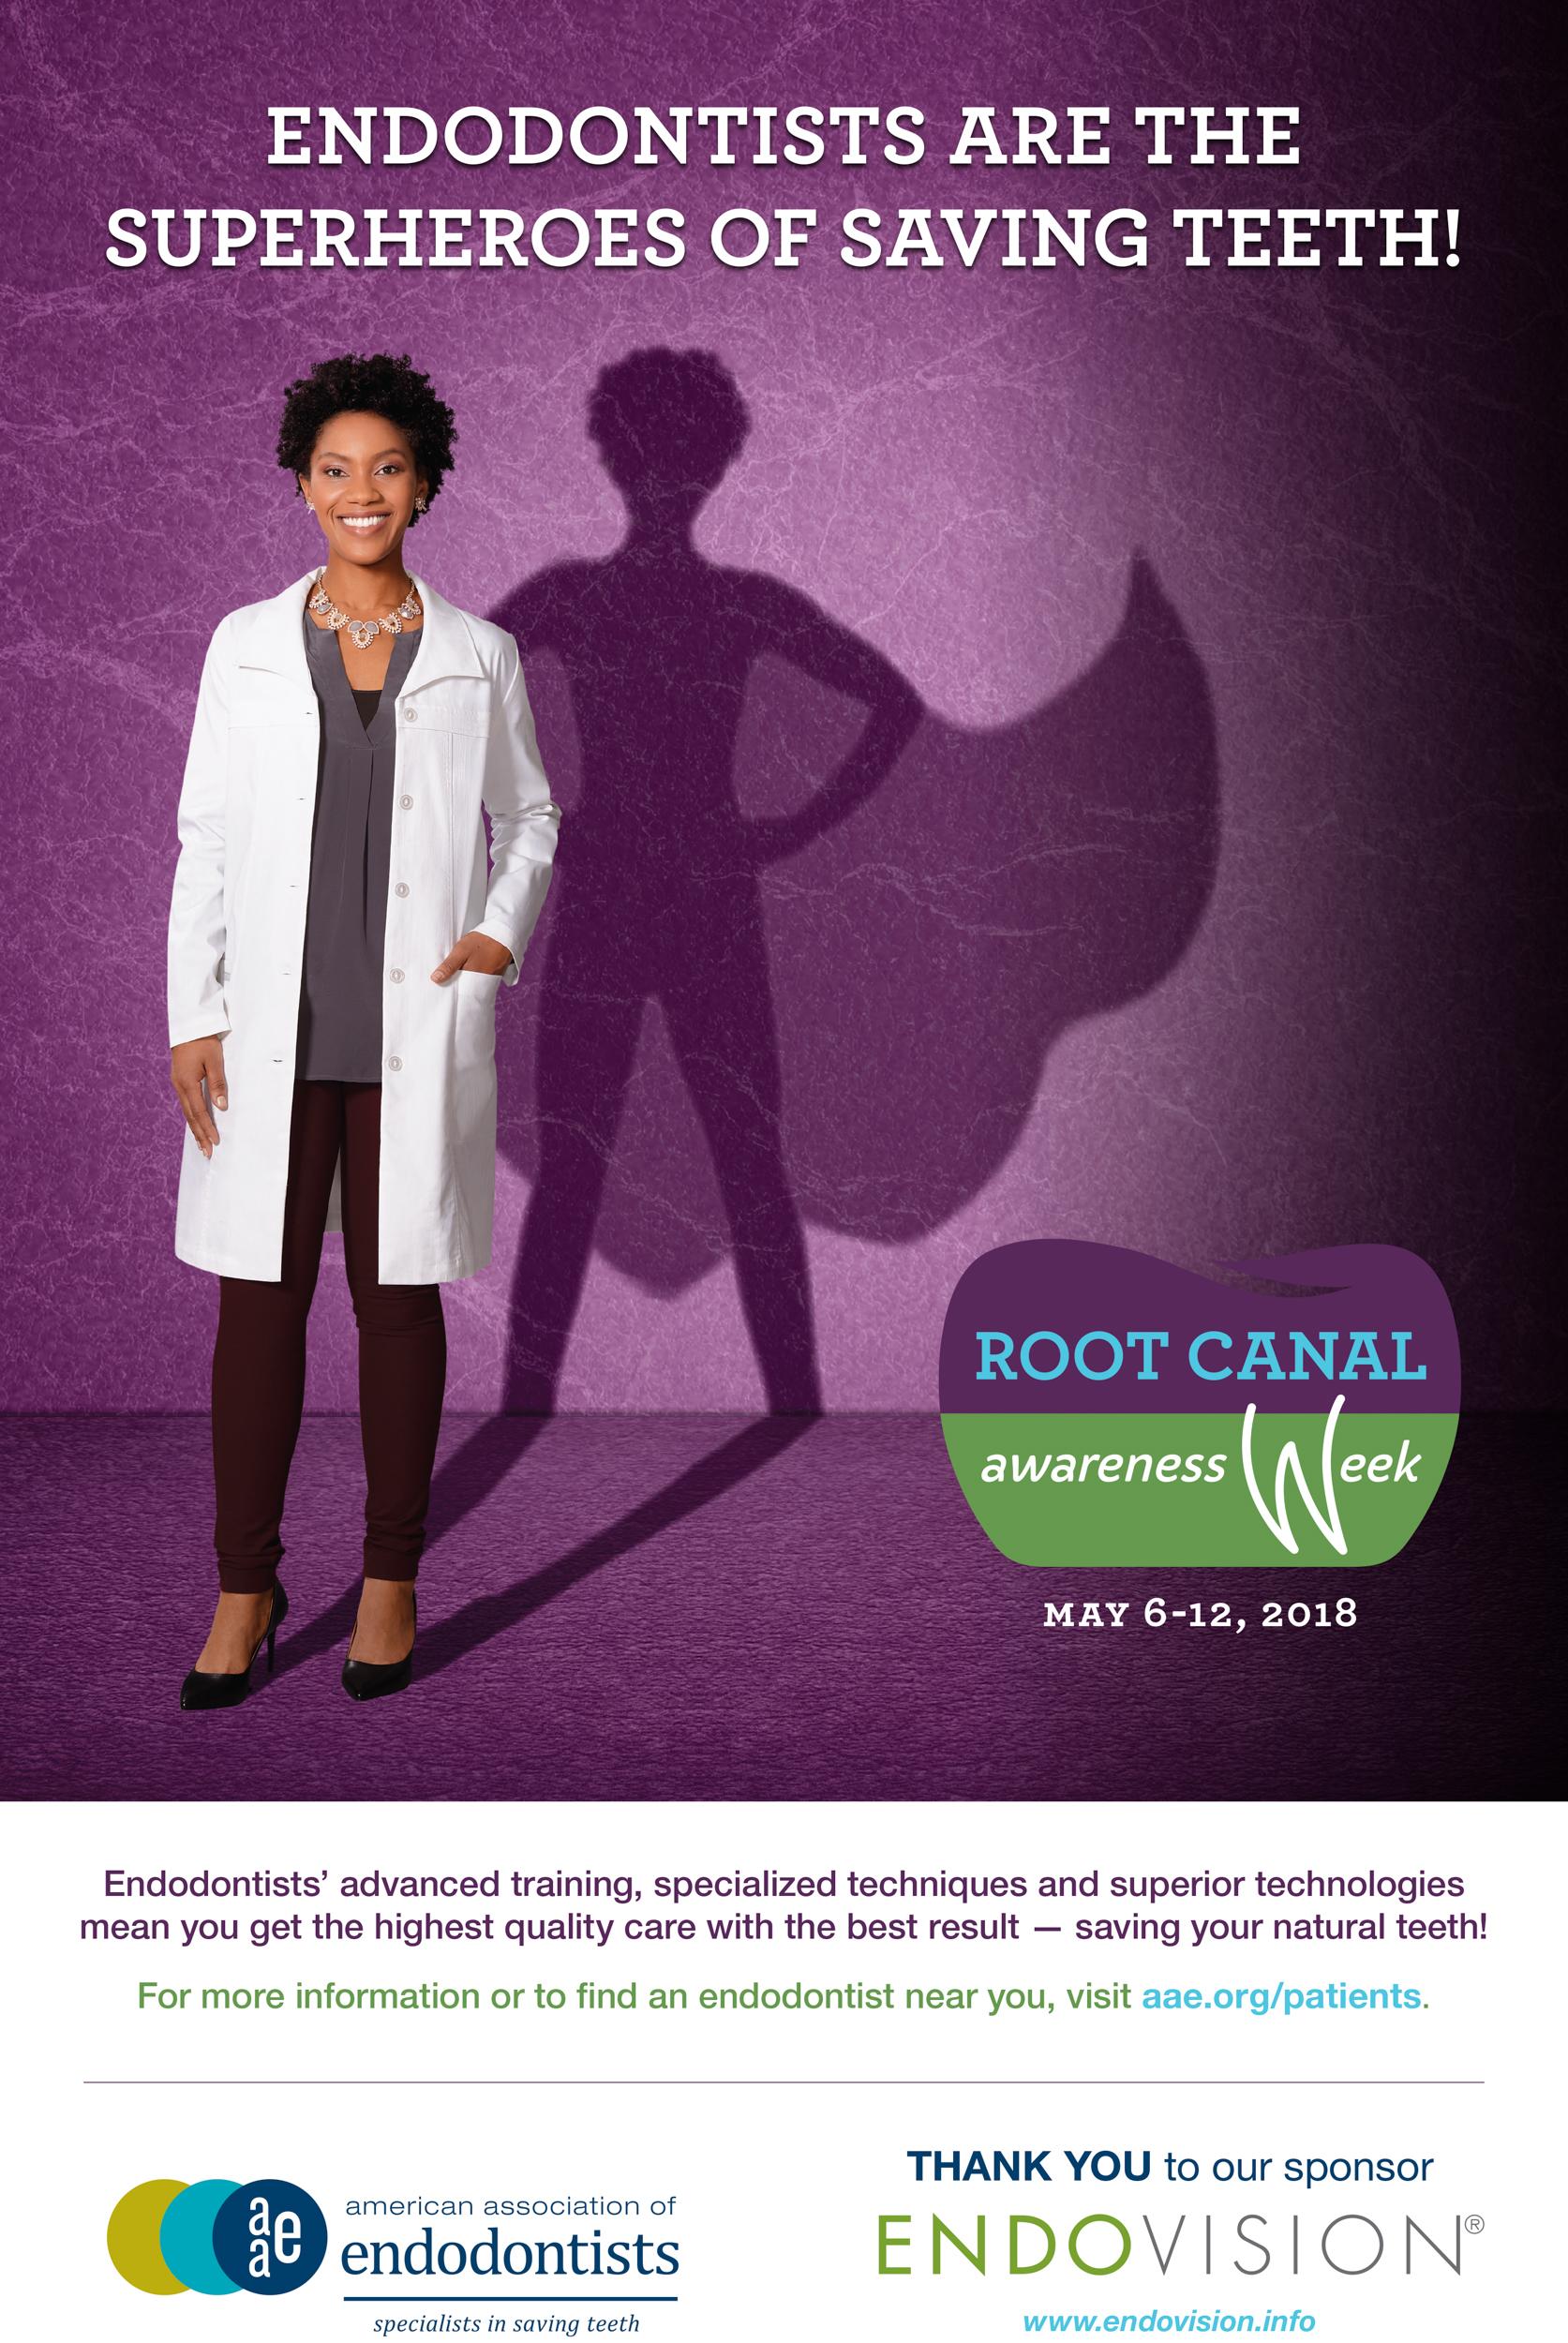 American Association of Endodontists - Lisa Predko